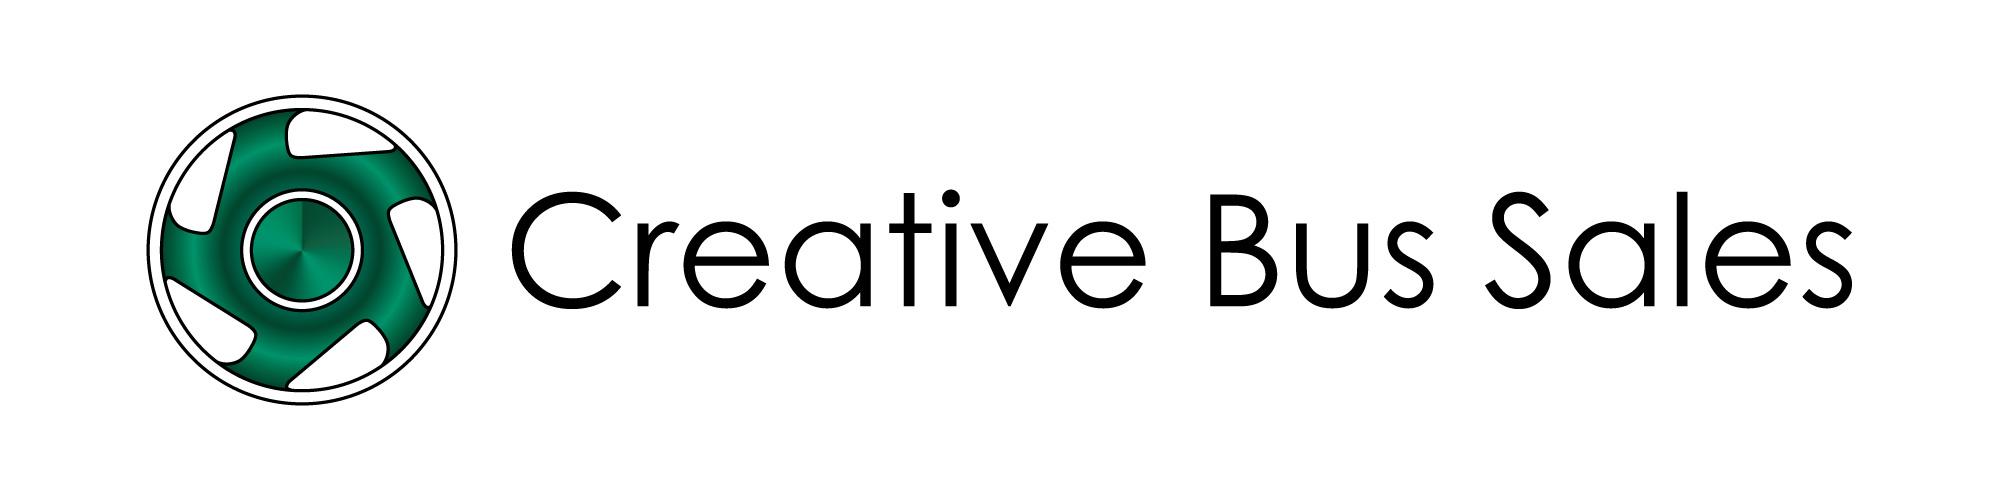 Creative Bus Sales, Inc. Logo 2017